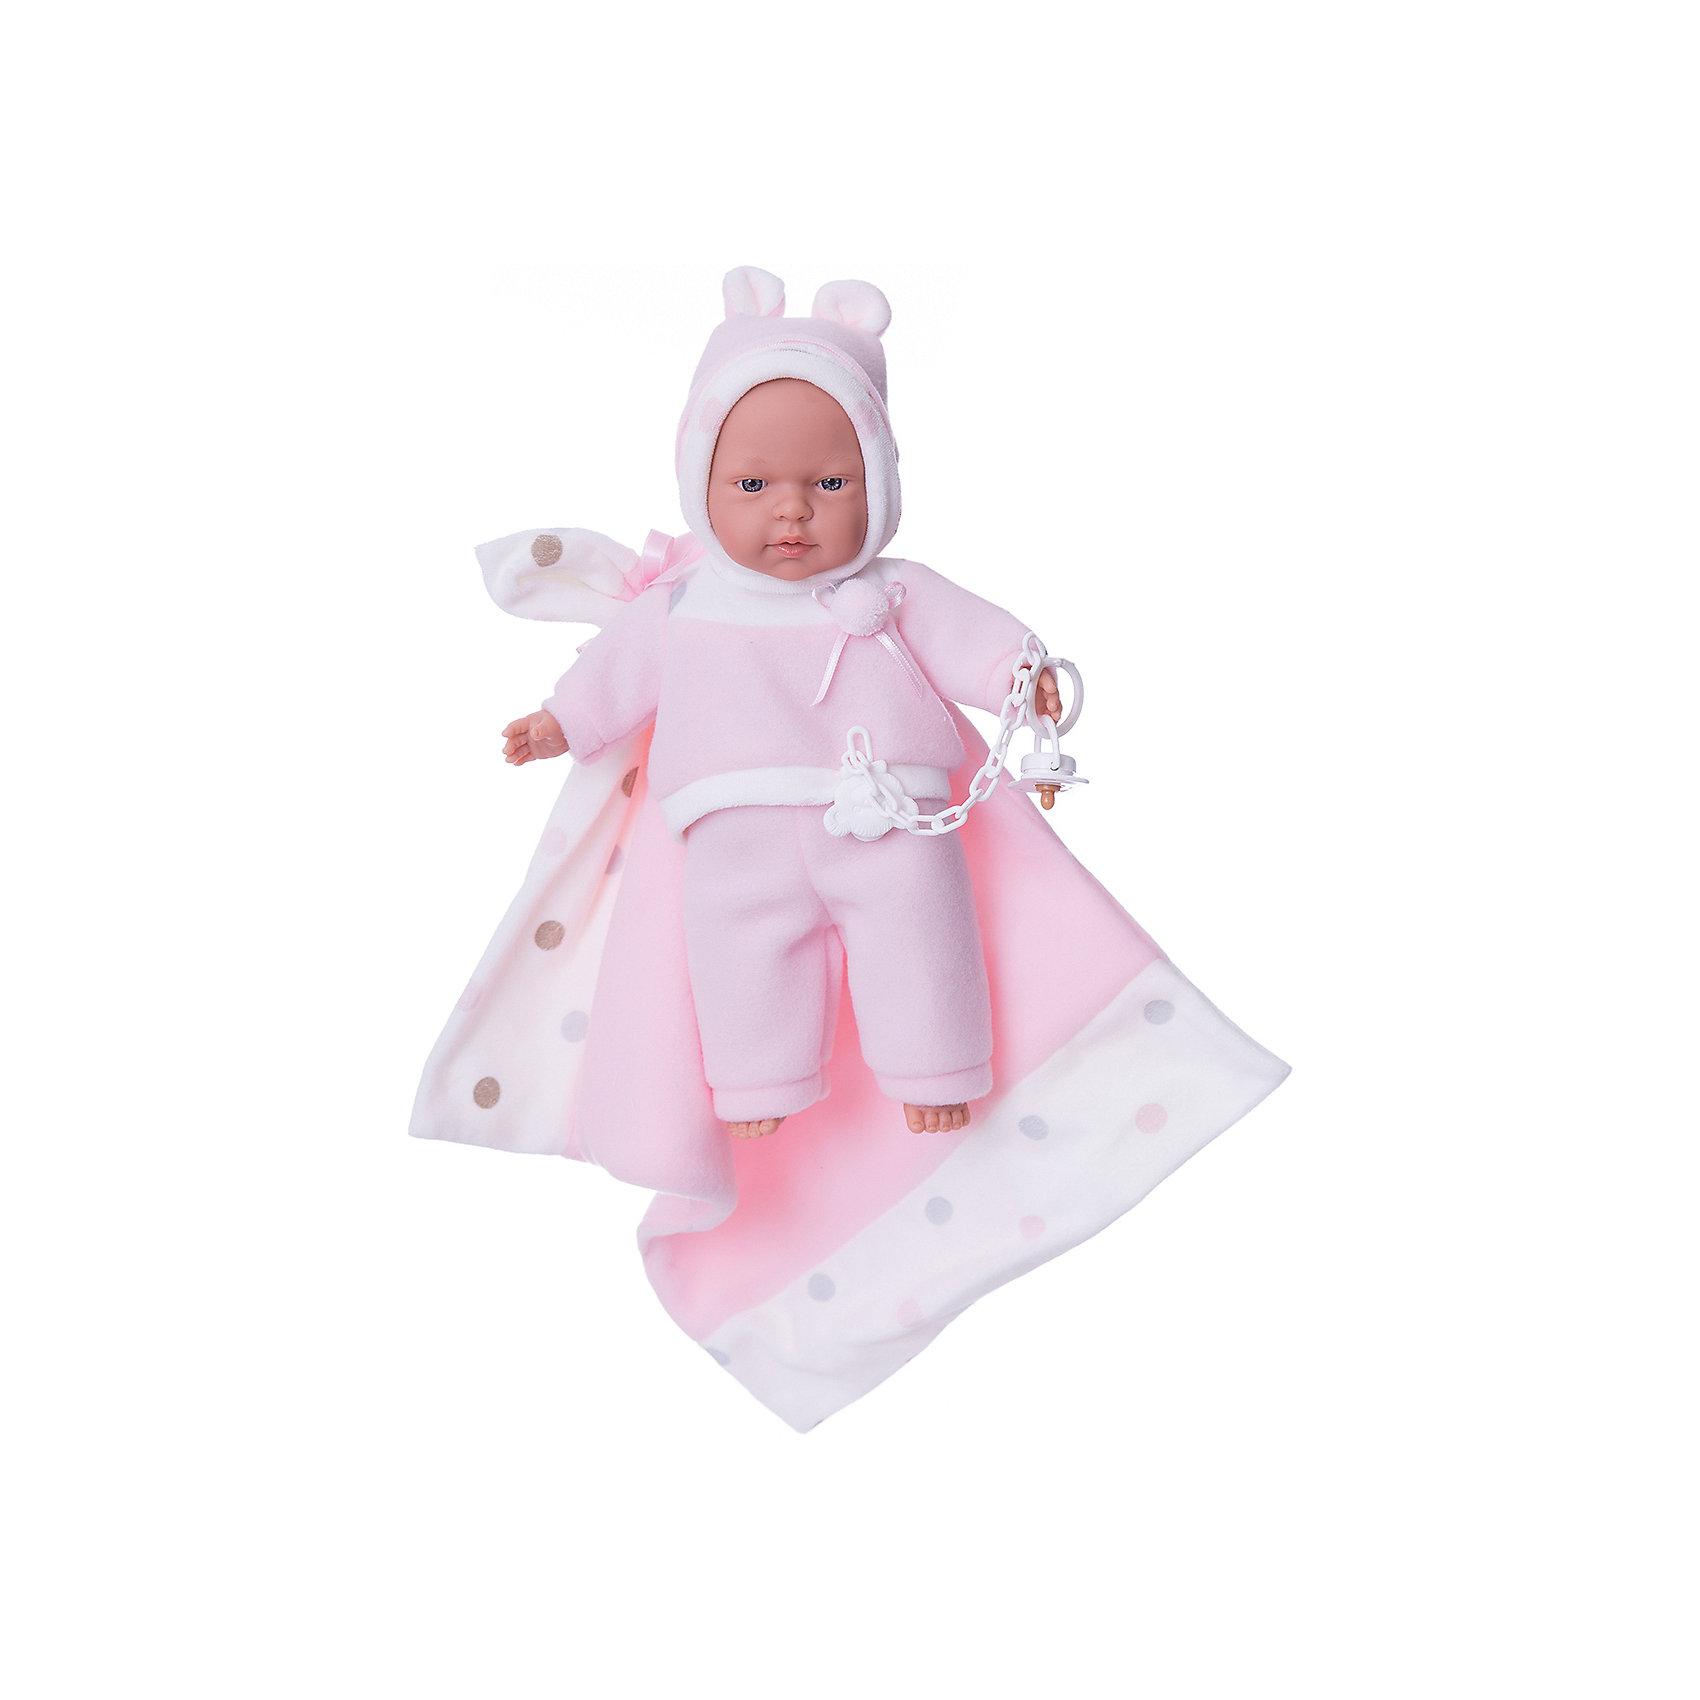 Llorens Кукла Люсия с одеялом, 33 см, Llorens куклы и одежда для кукол llorens кукла изабела 33 см со звуком